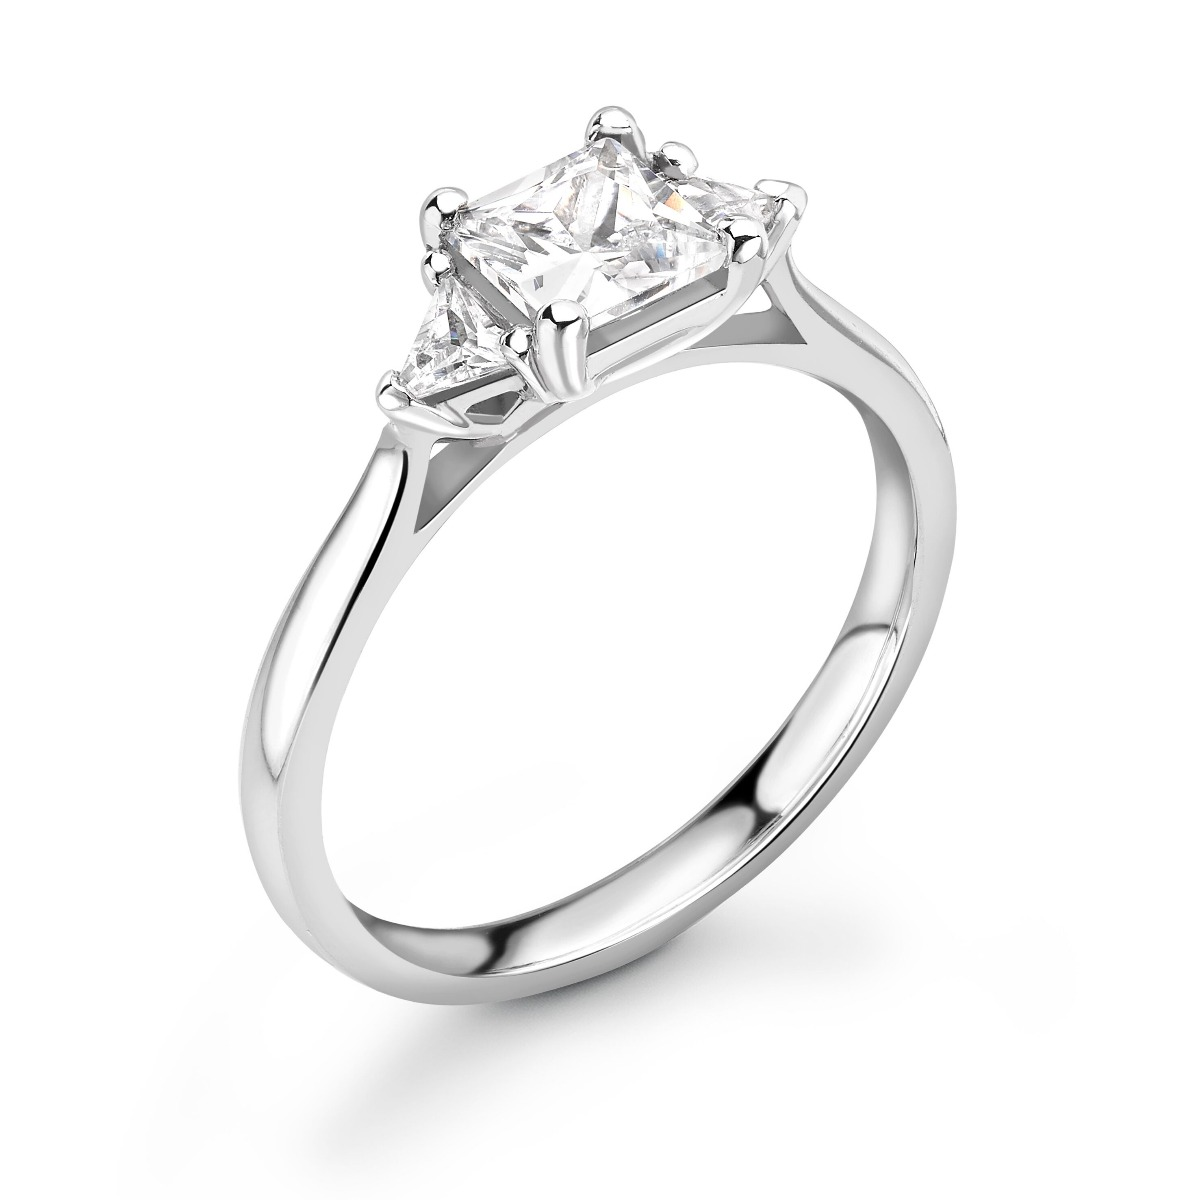 1.19ct Georgia Trilogy | Princess & Trillion Diamond 3 Stone Engagement Ring | 18K White Gold